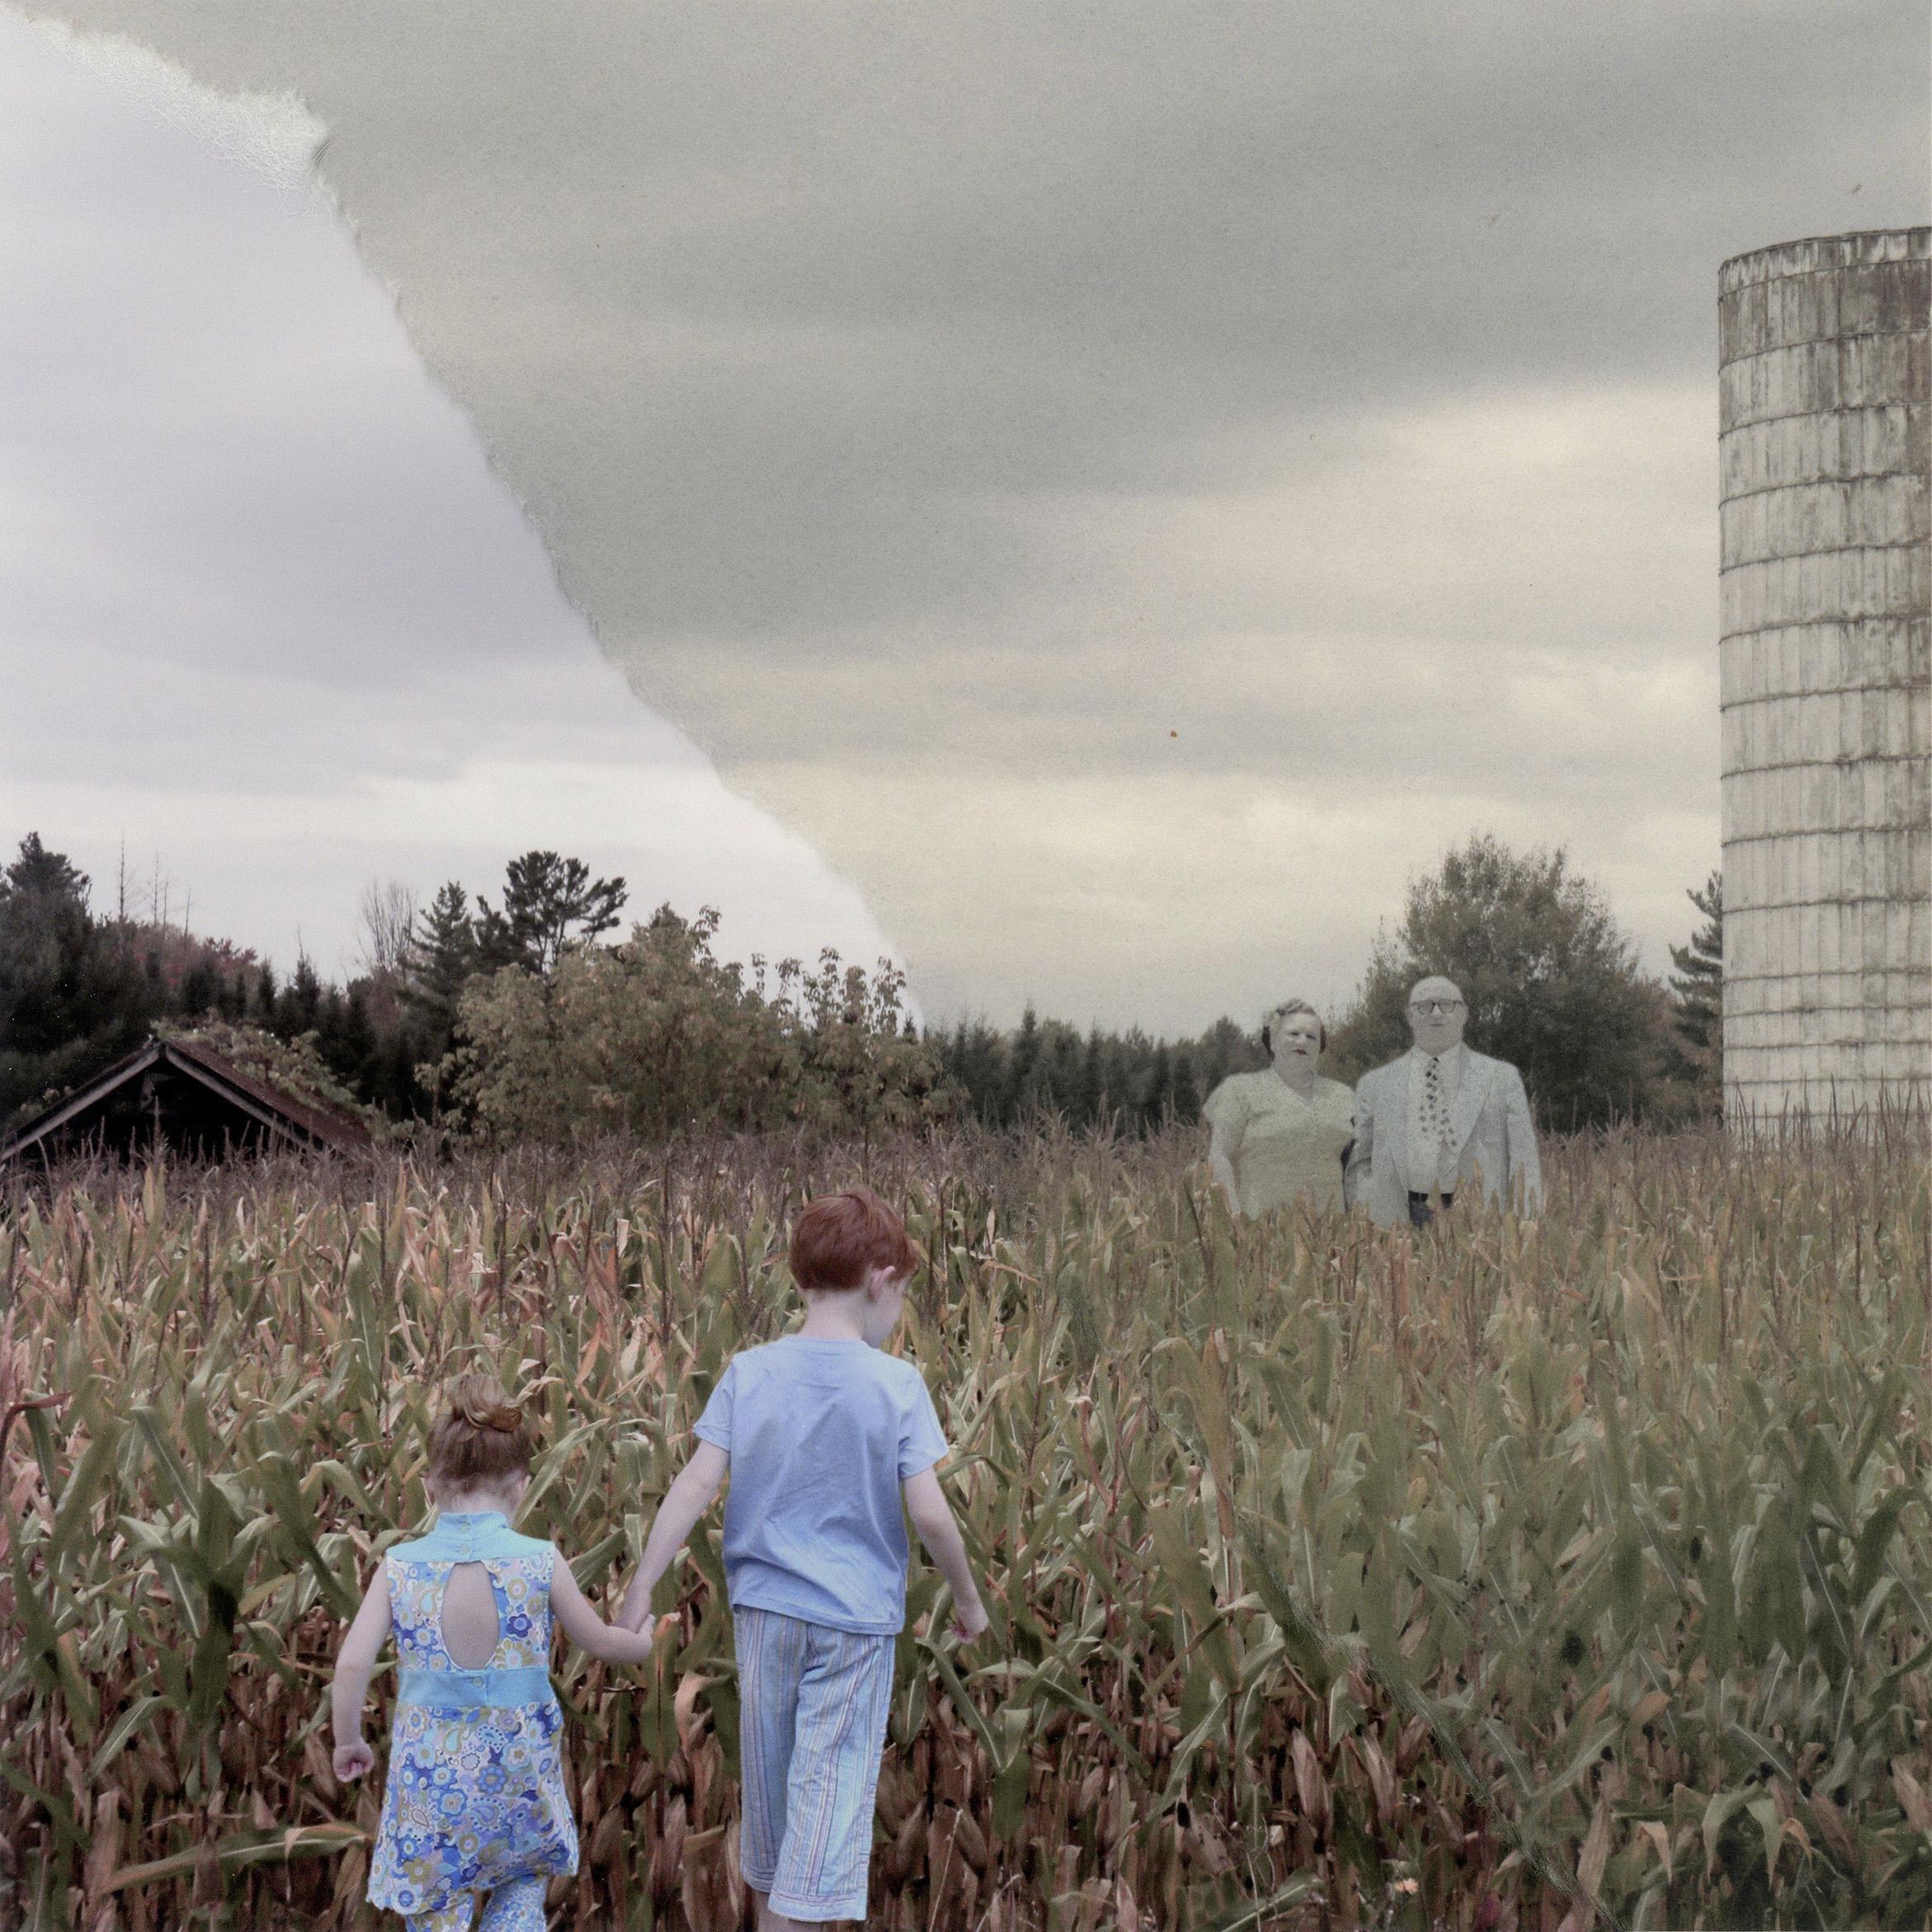 © Diana Cheren Nygren | The Persistence of Family